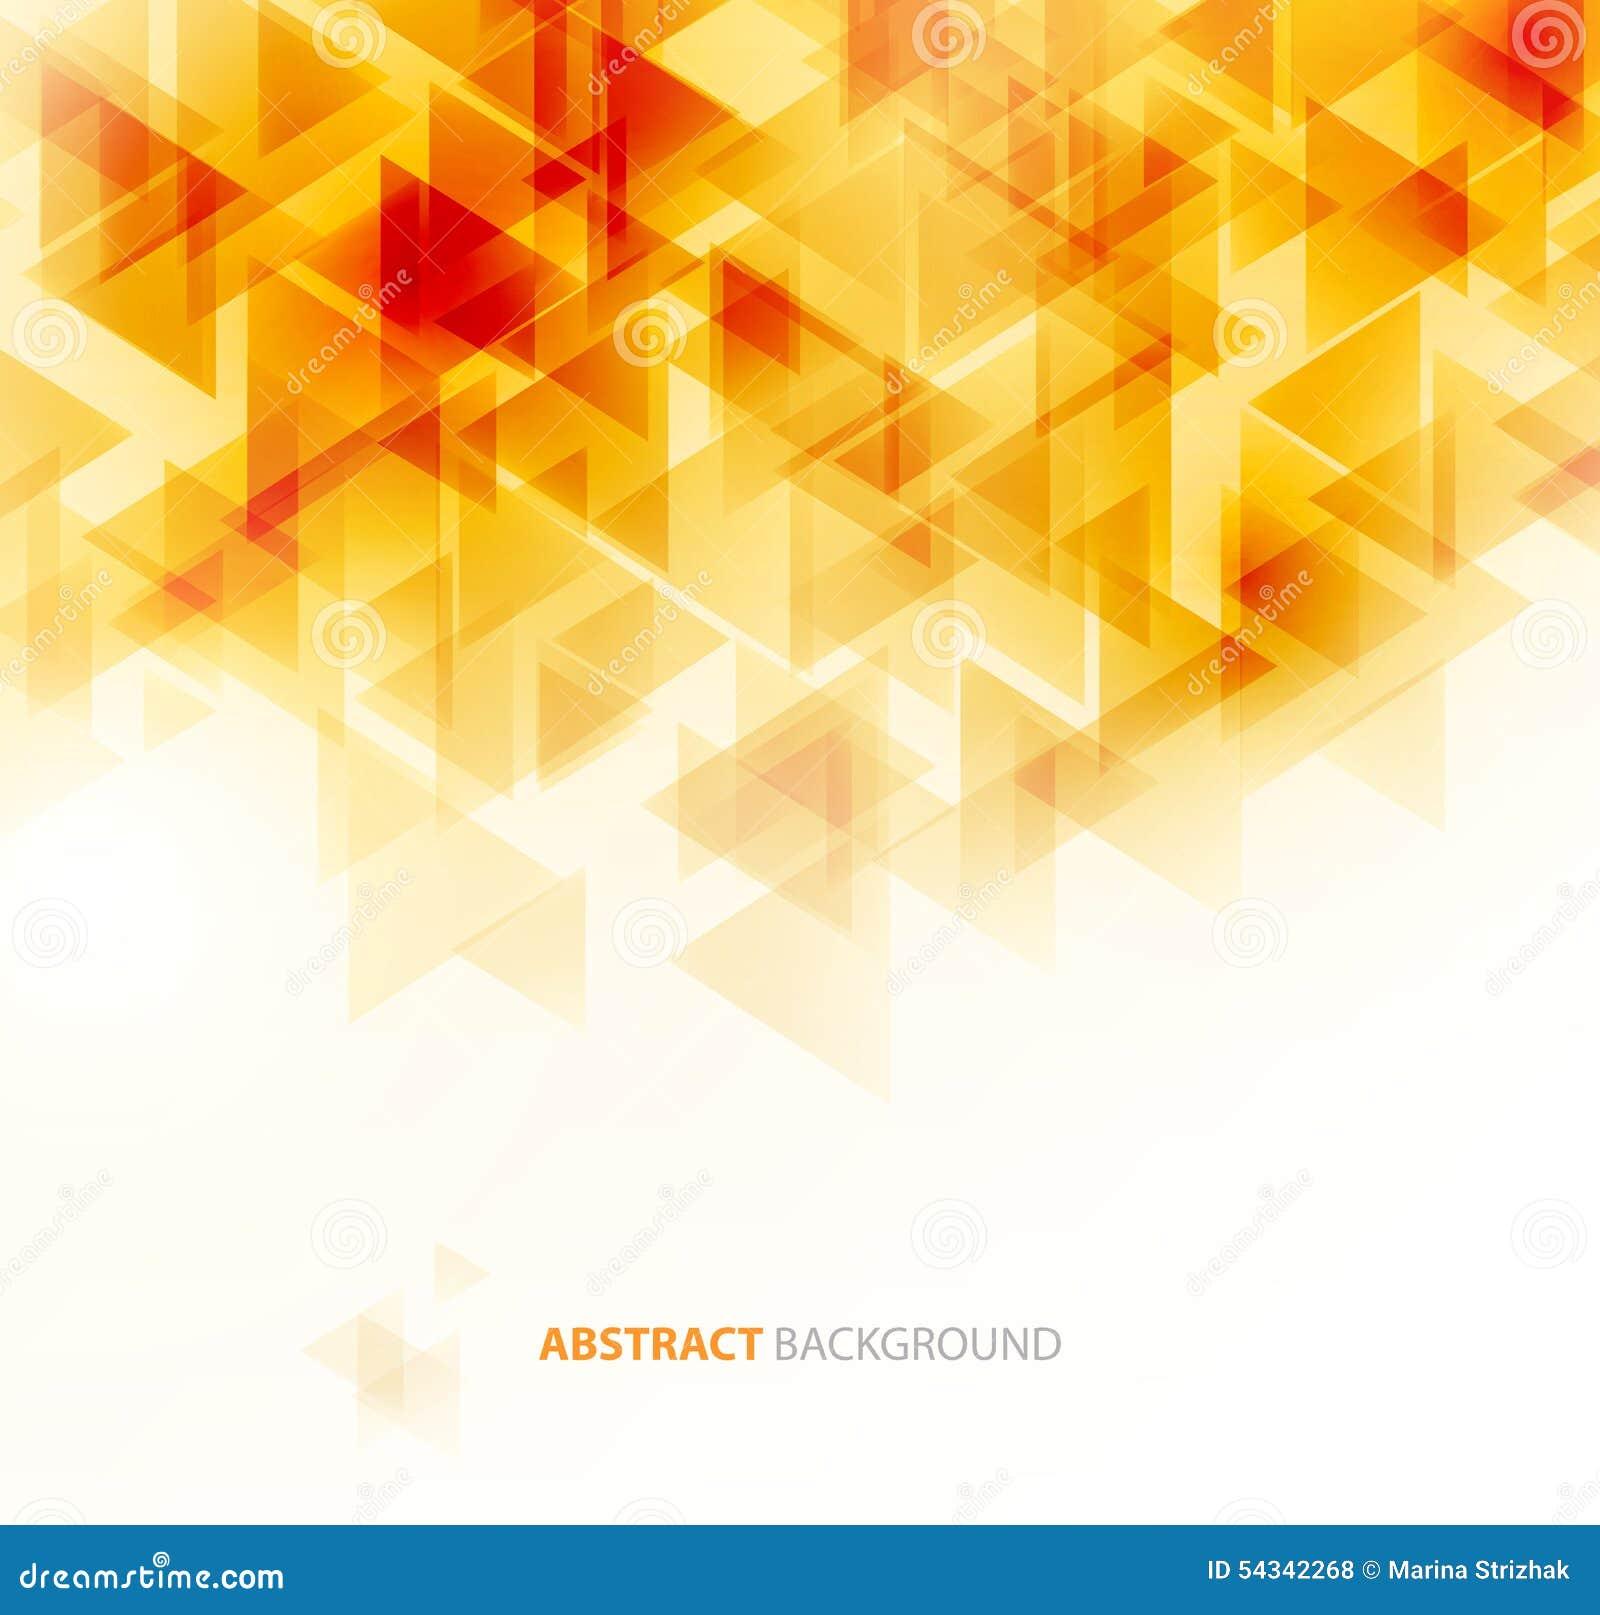 Orange Shiny Technical Background  Vector Stock Vector